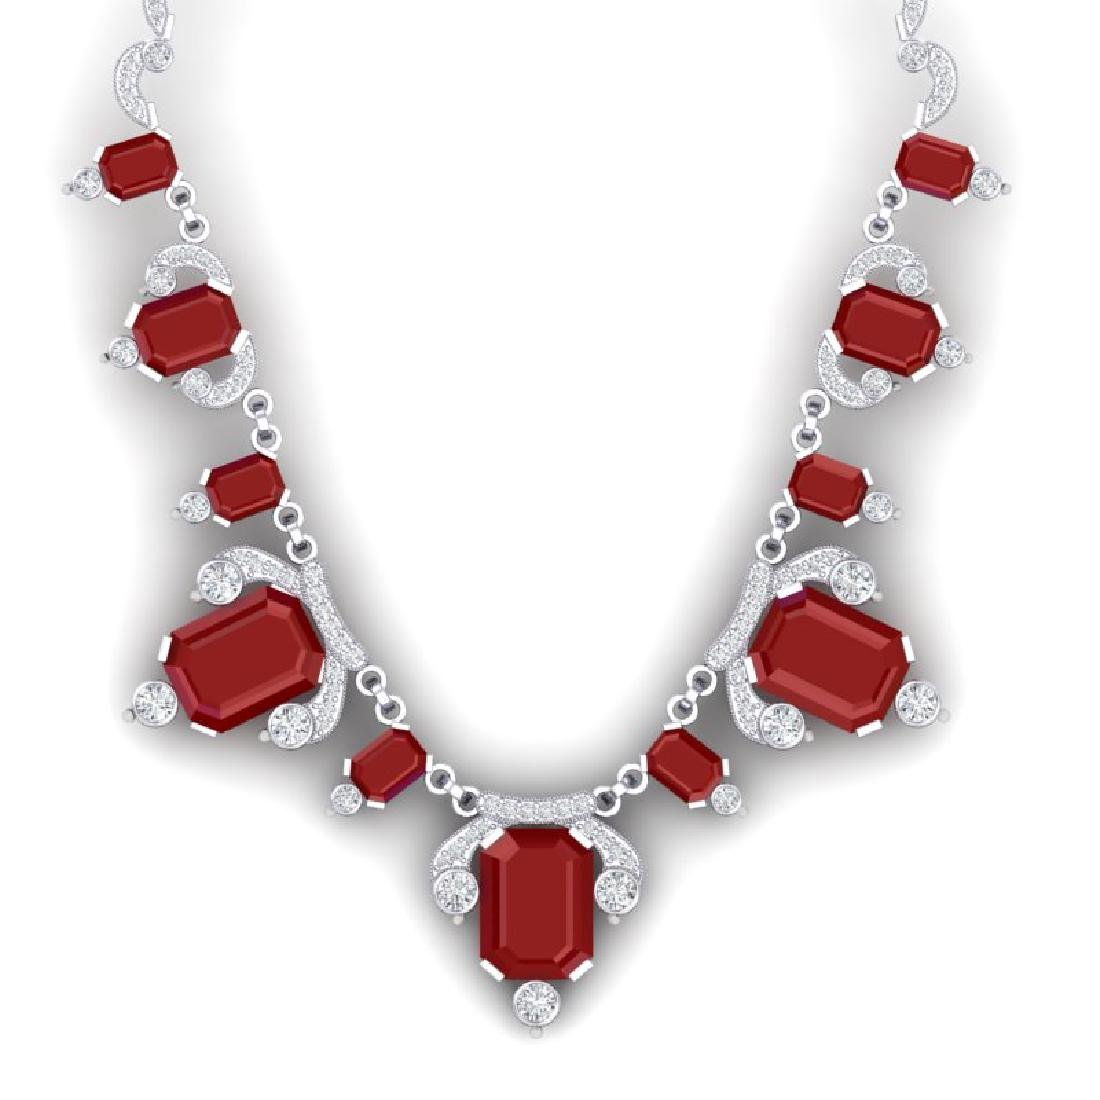 75.21 CTW Royalty Ruby & VS Diamond Necklace 18K White